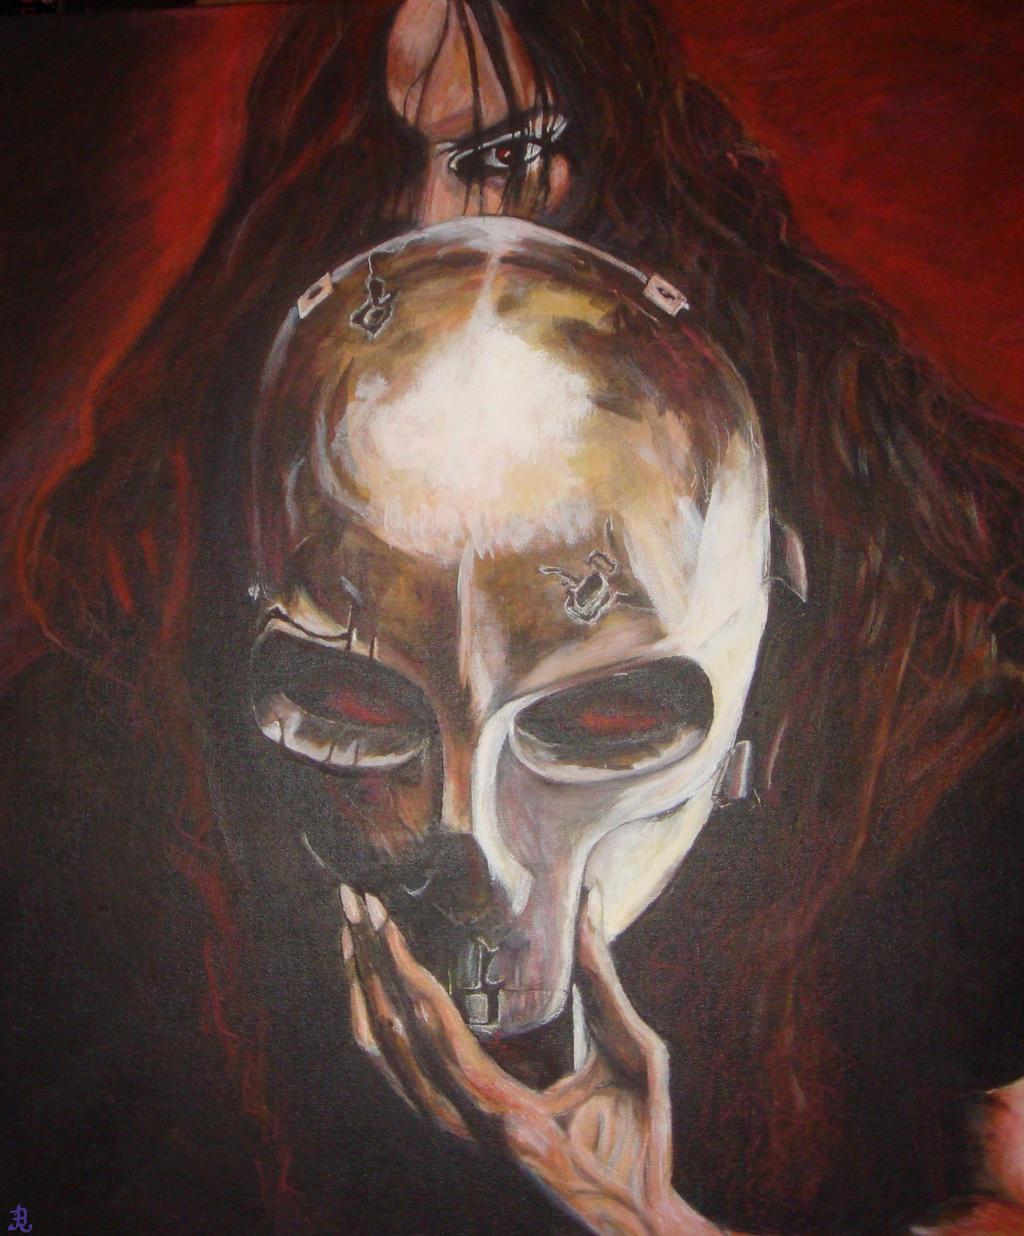 Mask of the Vigilante by RJTrinket